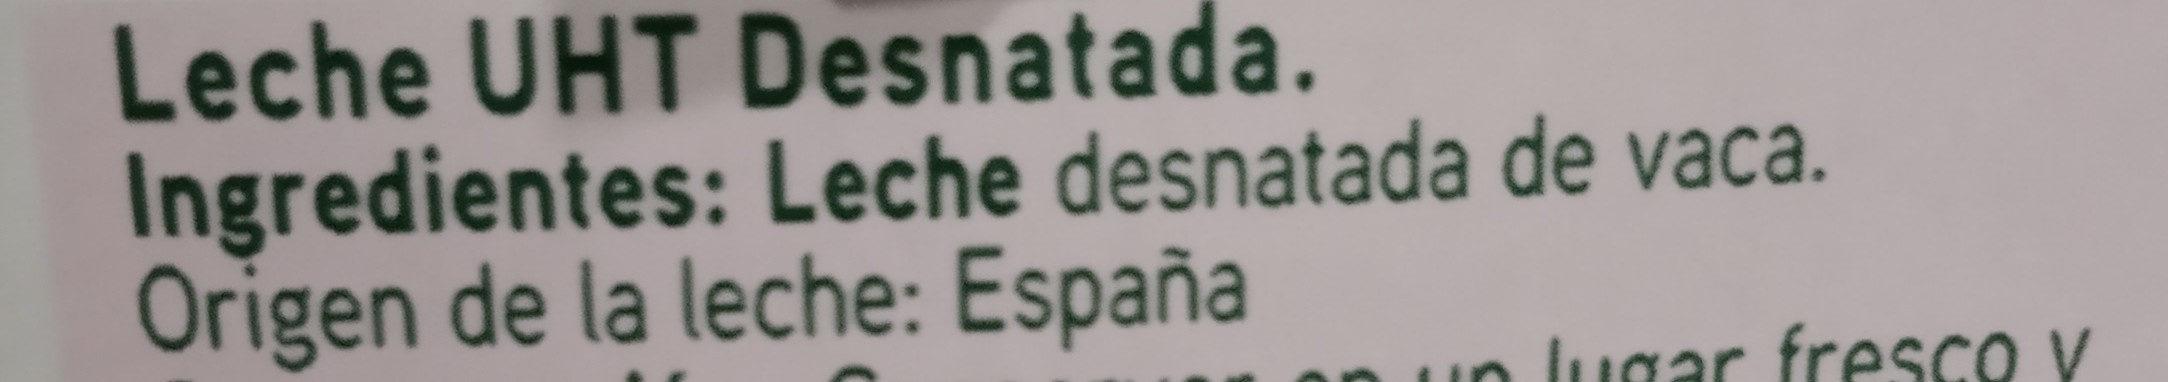 Leche UHT desnatada - Ingredientes - es